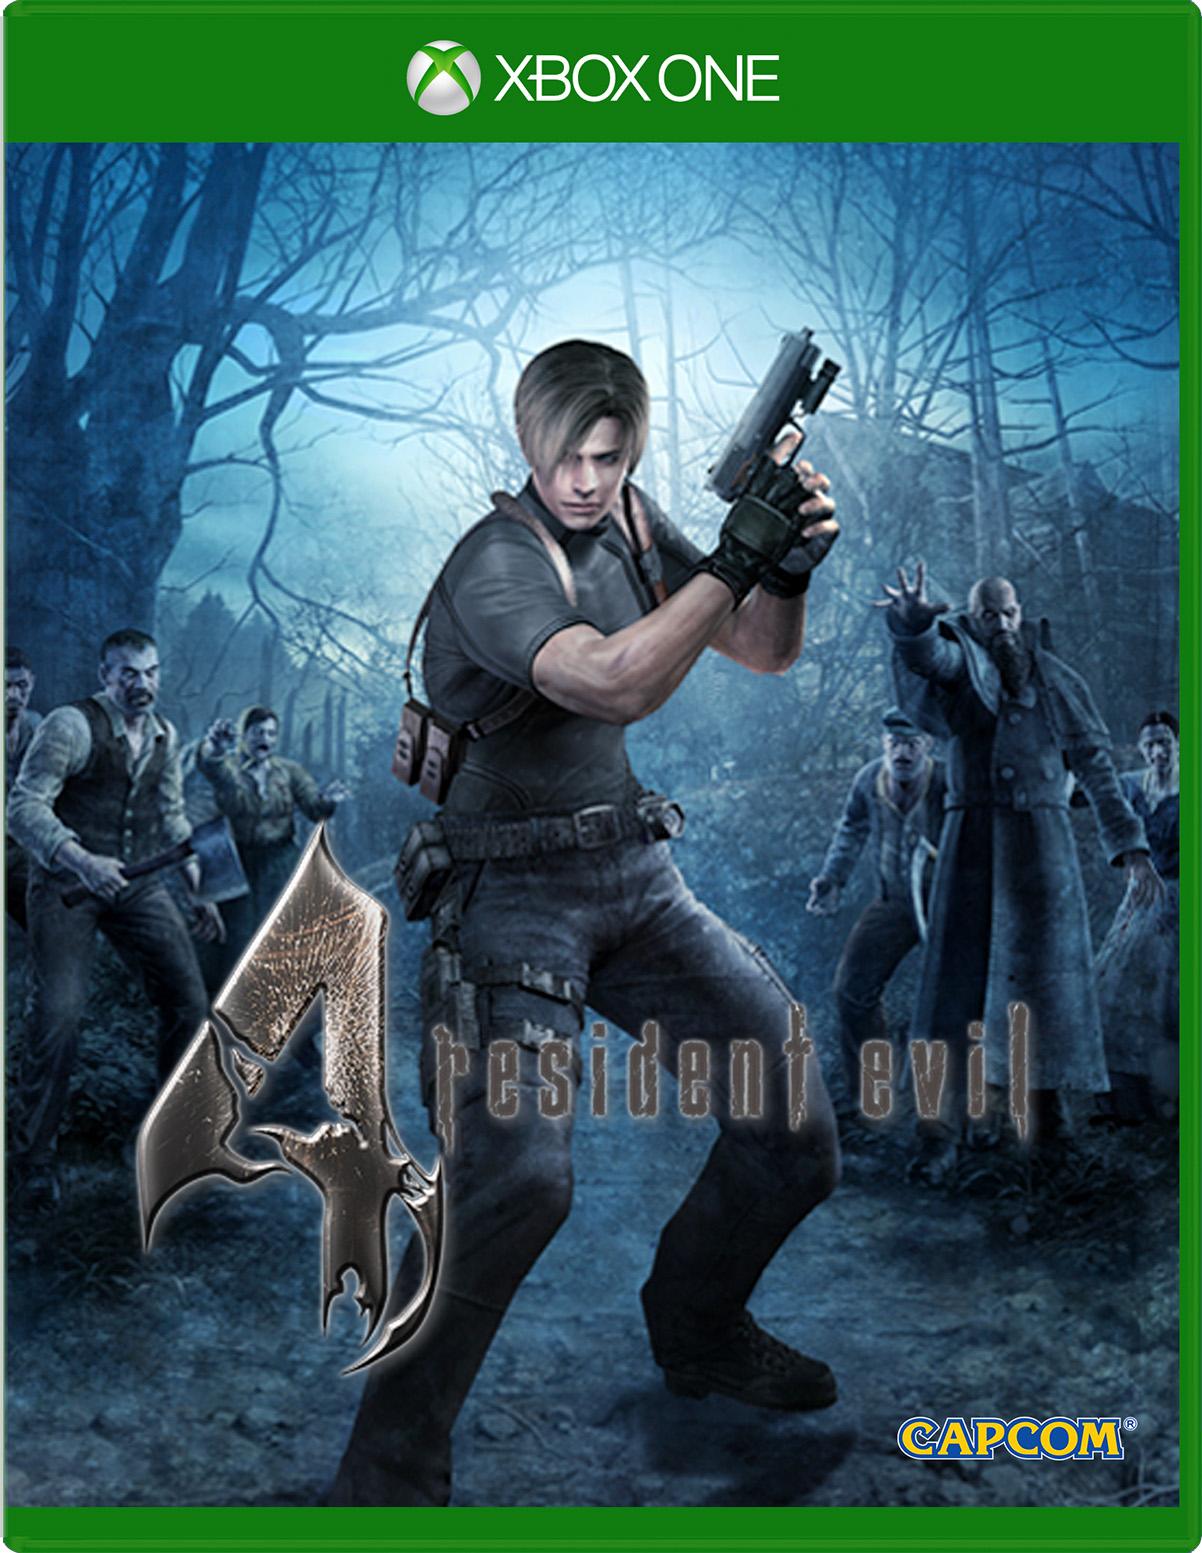 Resident Evil 4 for Xbox One